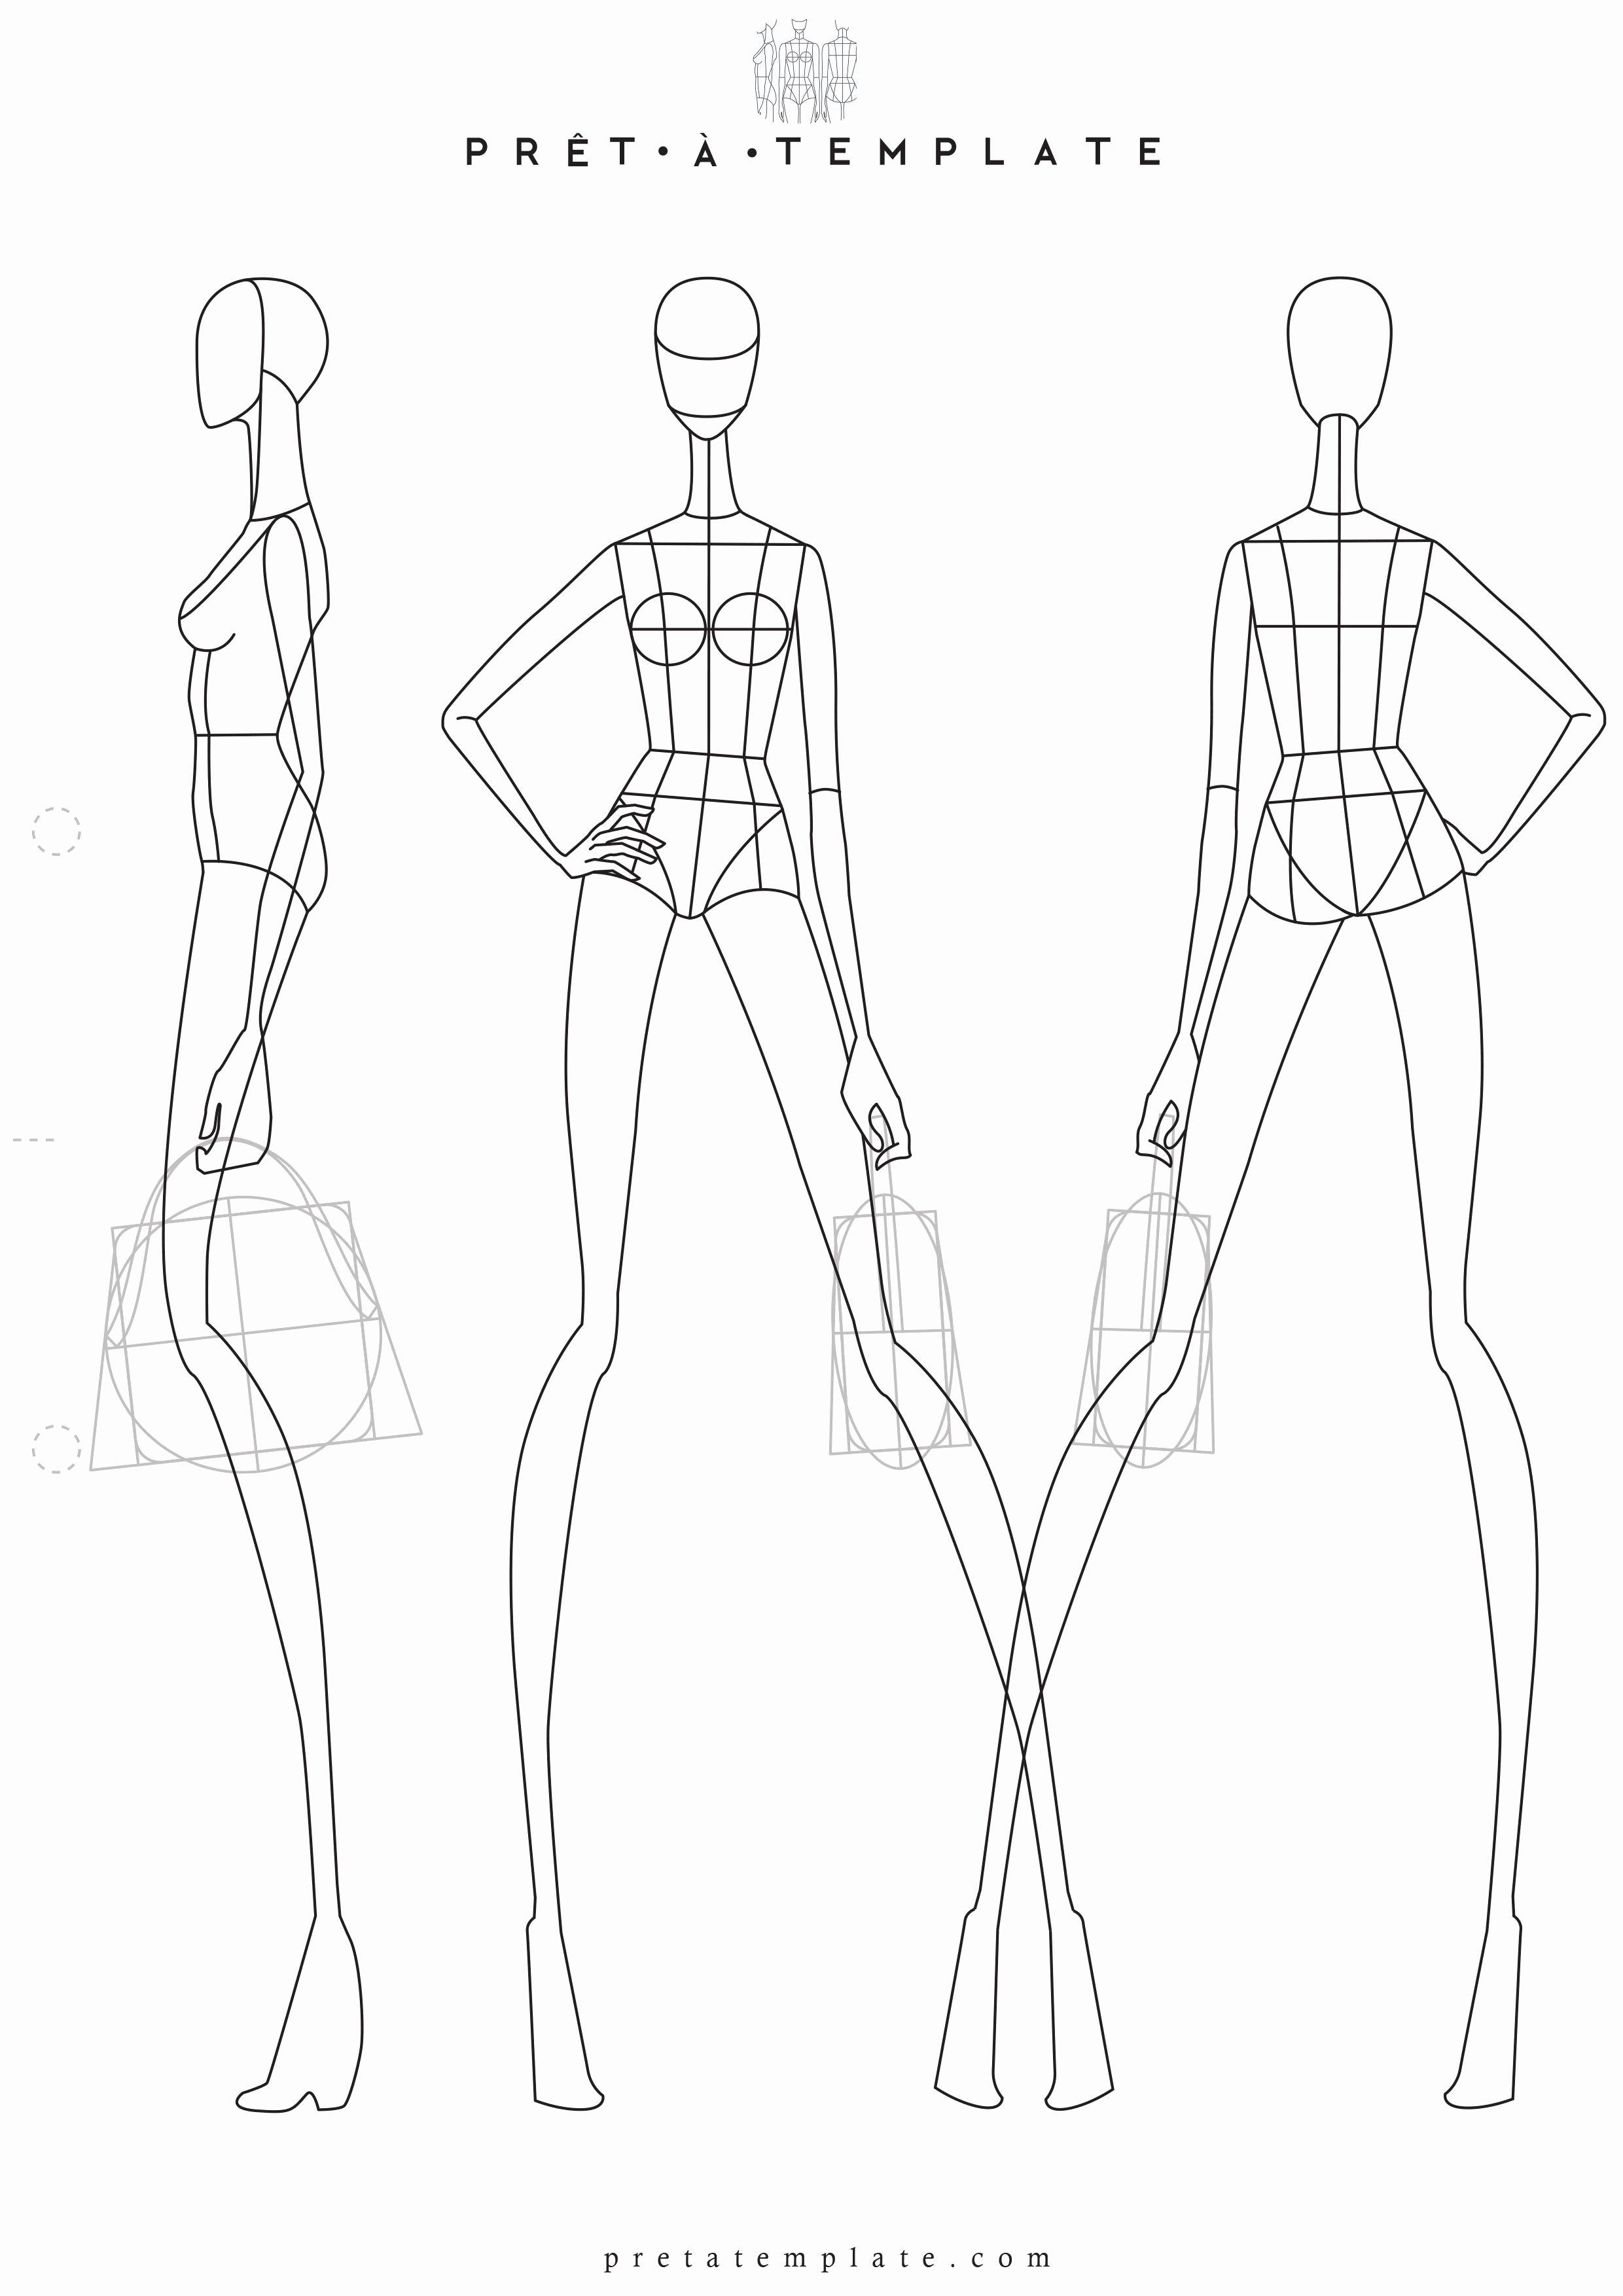 Fashion Design Template Female Fresh Woman Body Figure Fashion Template D I Y Your Own Fashion